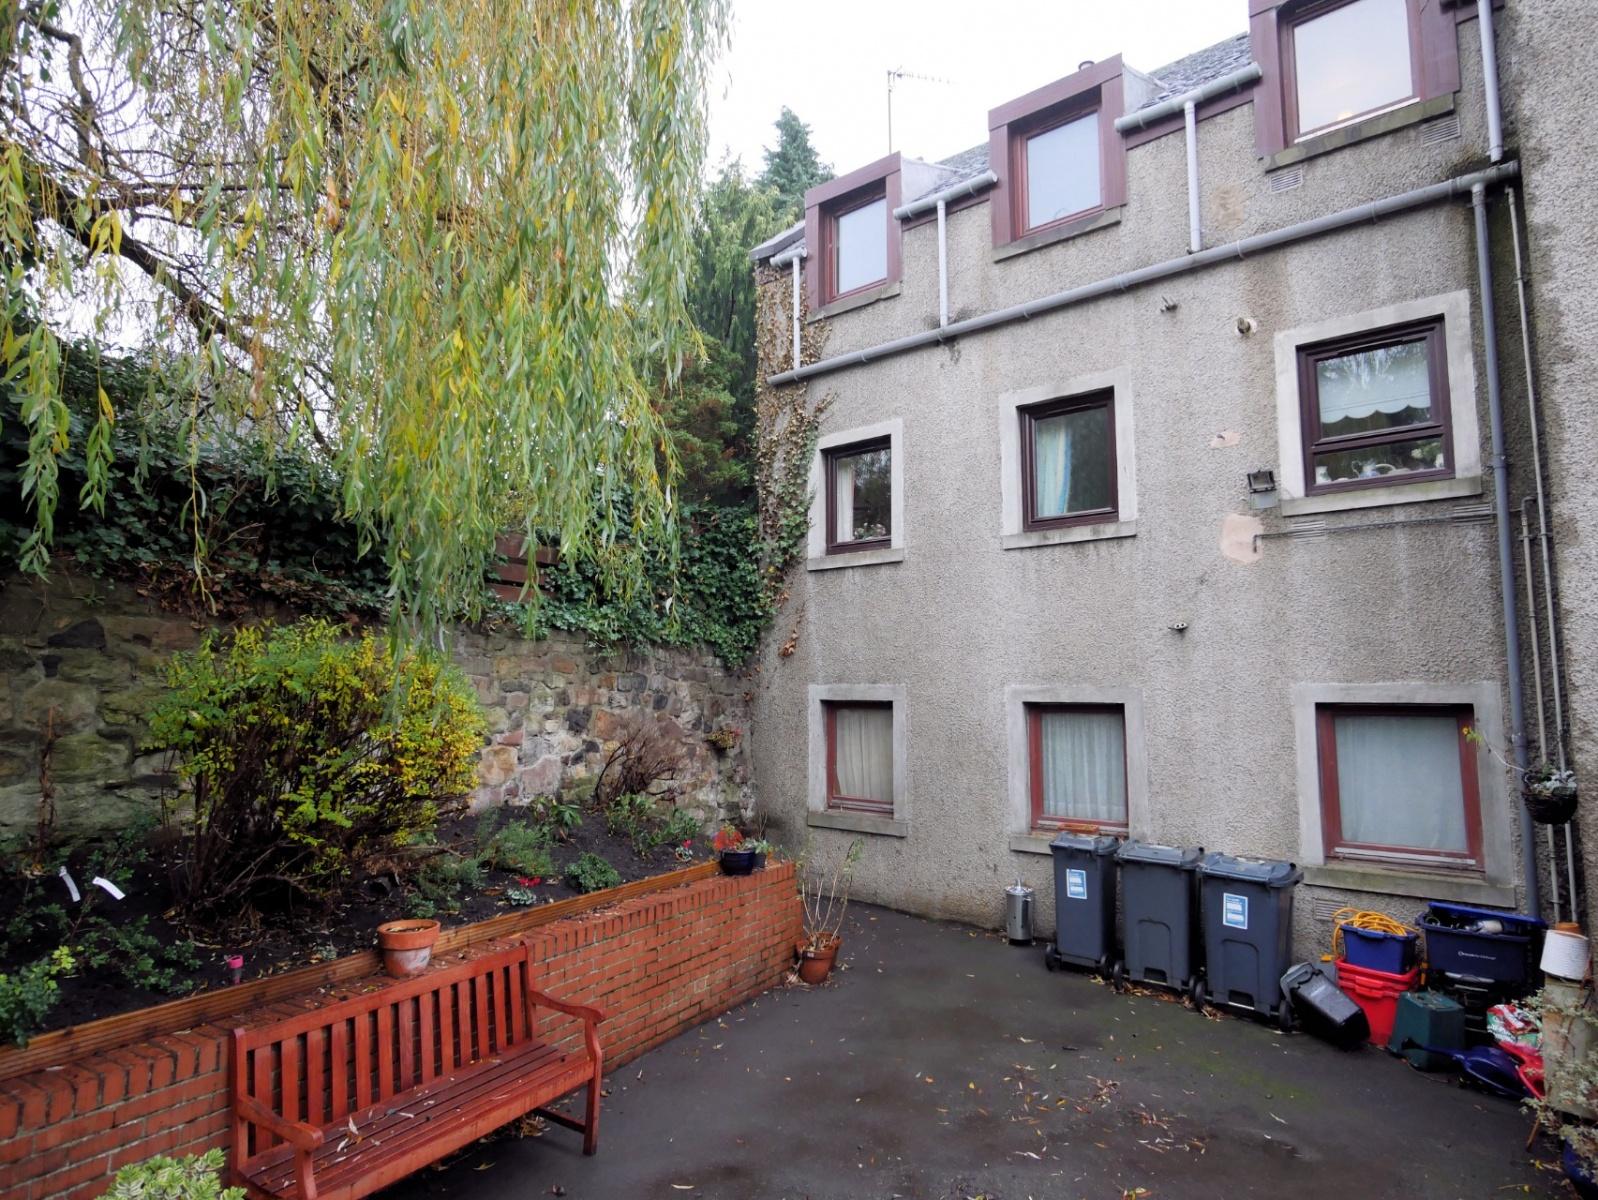 P462: Dunsapie Court, Duddingston Road West, Duddingston, Edinburgh